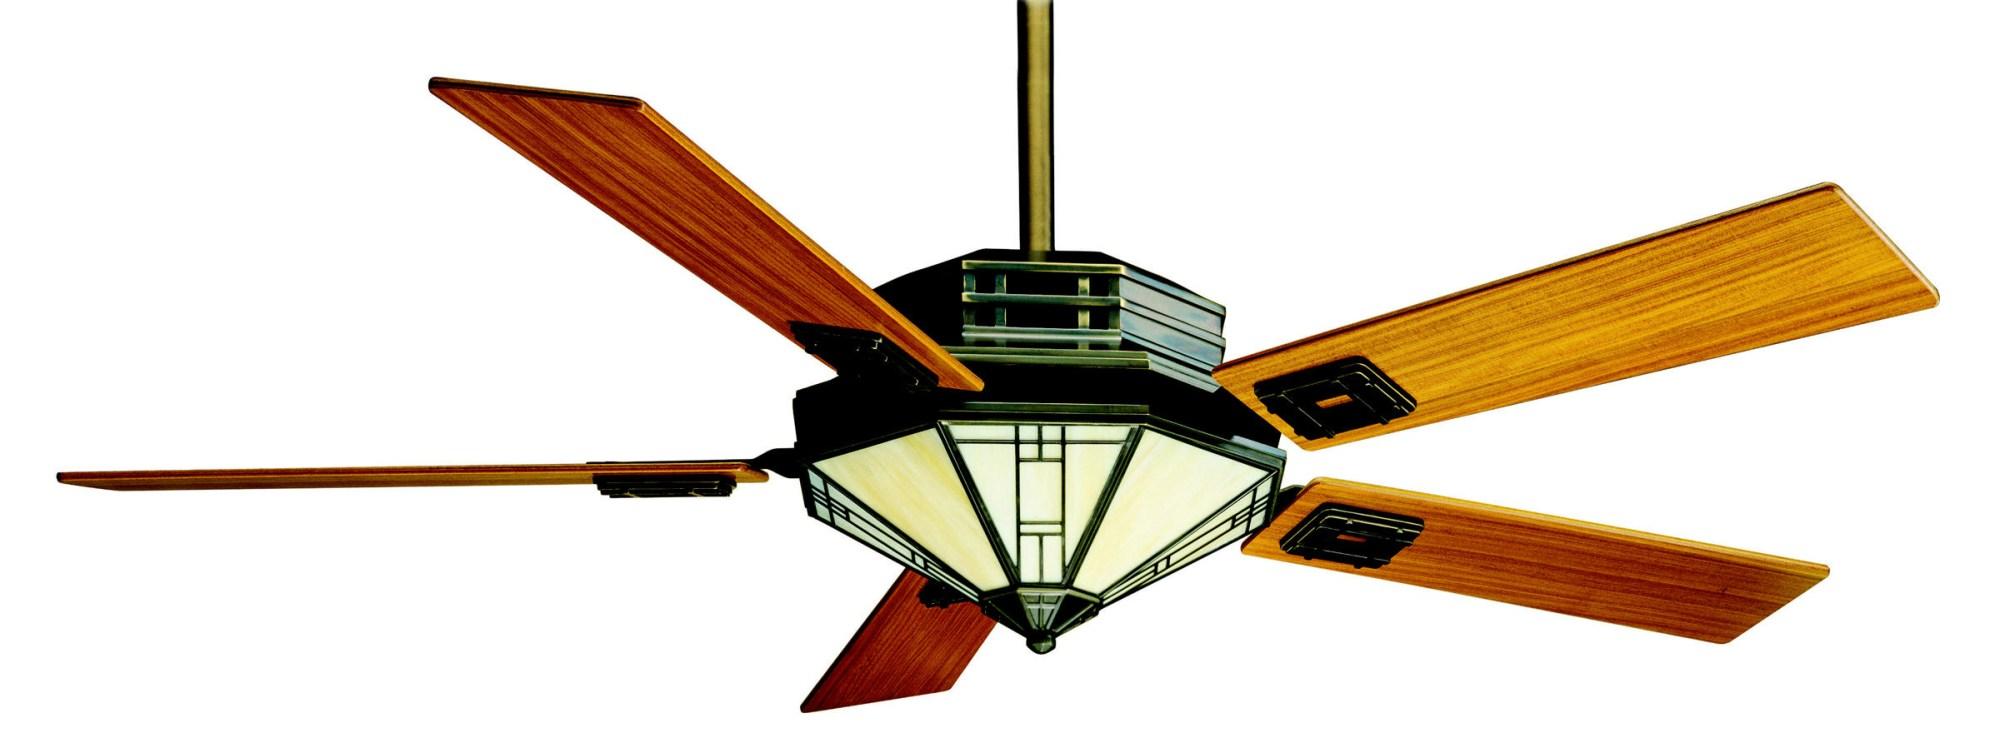 hight resolution of sears ceiling fan wiring harness wiring diagrams hubs hunter ceiling fan wiring diagram